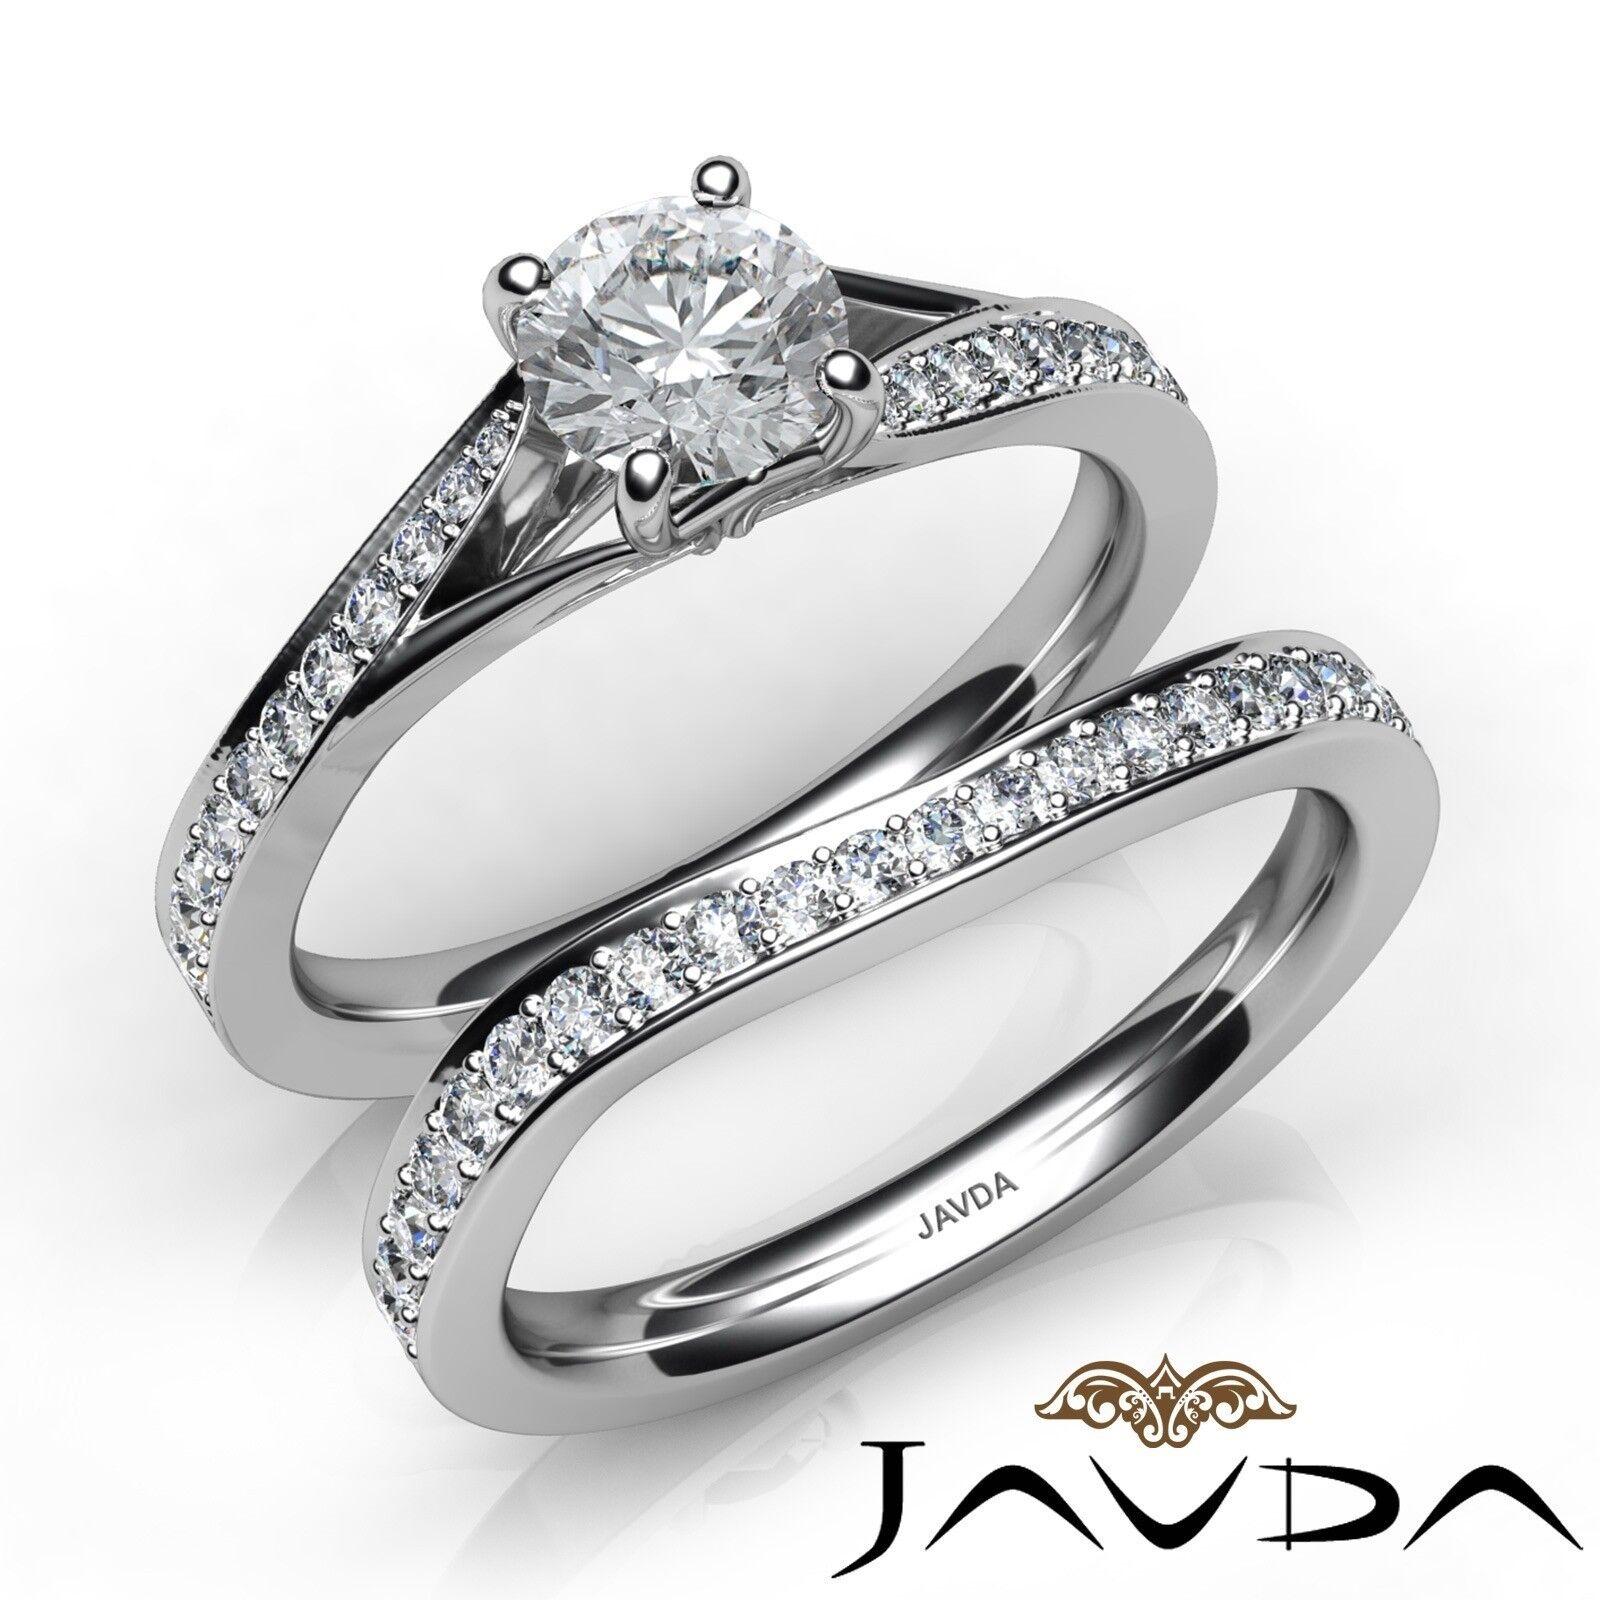 1.9ctw Sidestone Bridal Set Round Diamond Engagement Ring GIA E-VS2 White Gold